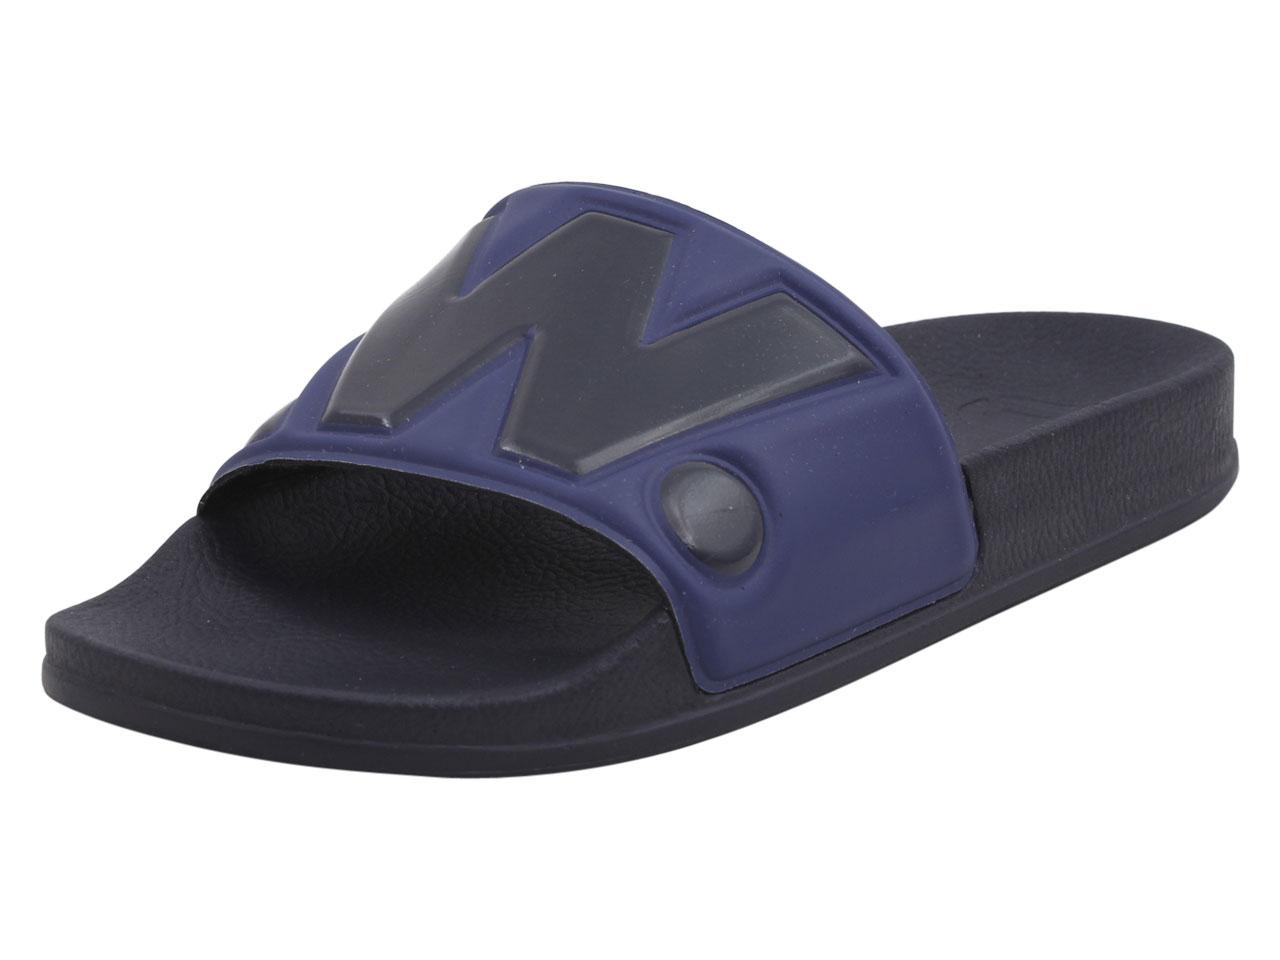 3fa265175a5 G-Star Raw Cart-Slide-II Sartho Blue Swedish Blue Slides Sandals ...